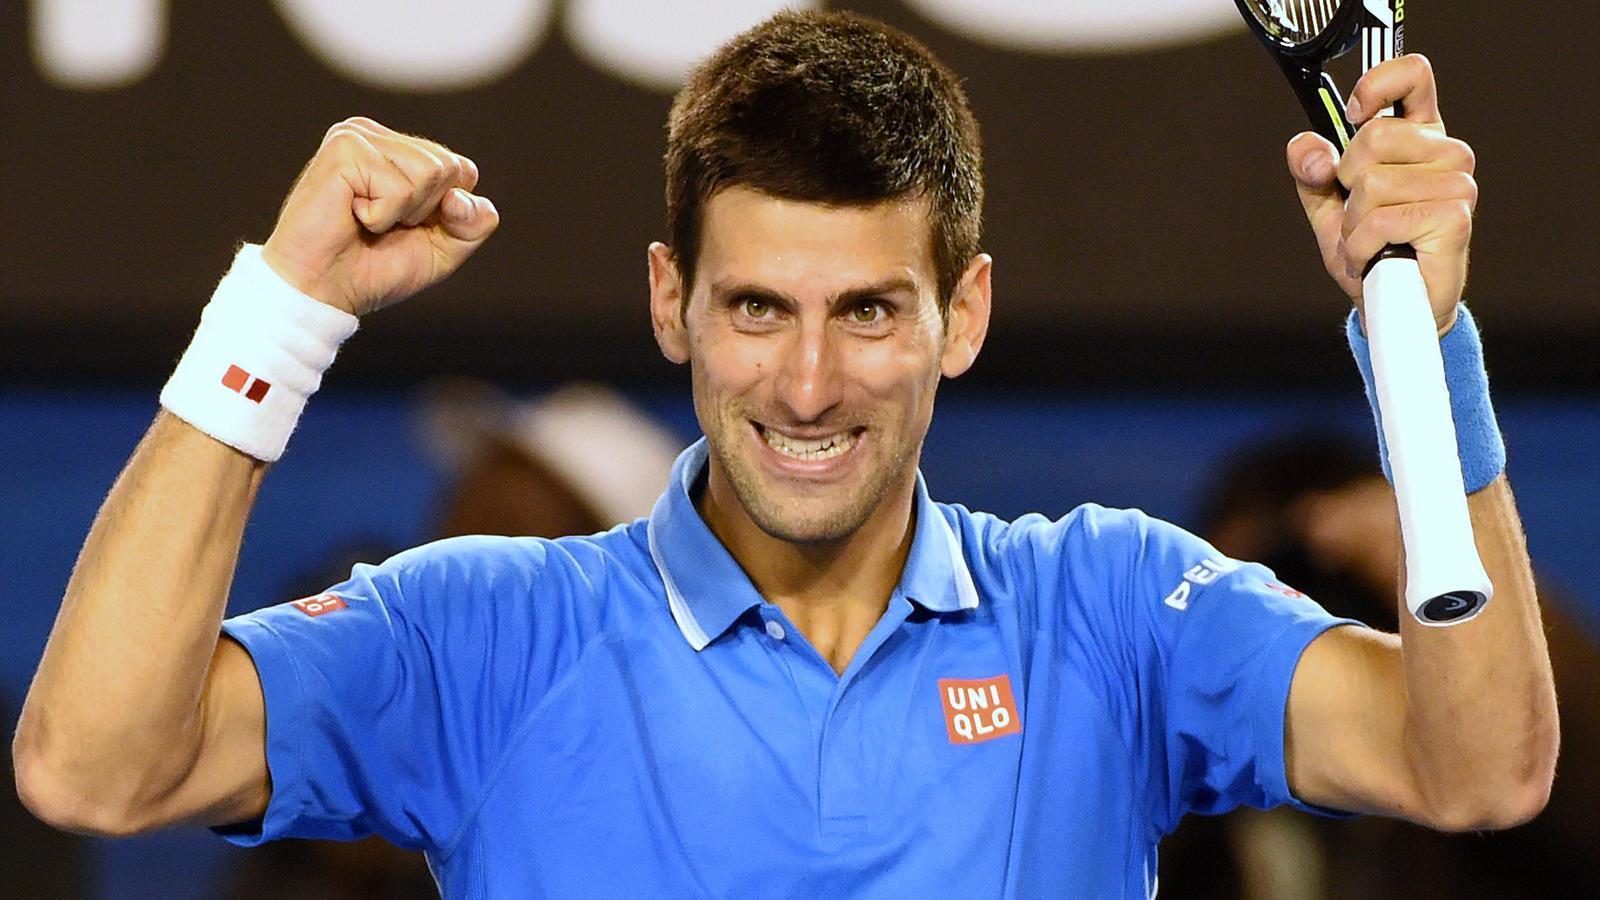 Novak Djokovic Takes On Andy Murray For 2015 Miami Open